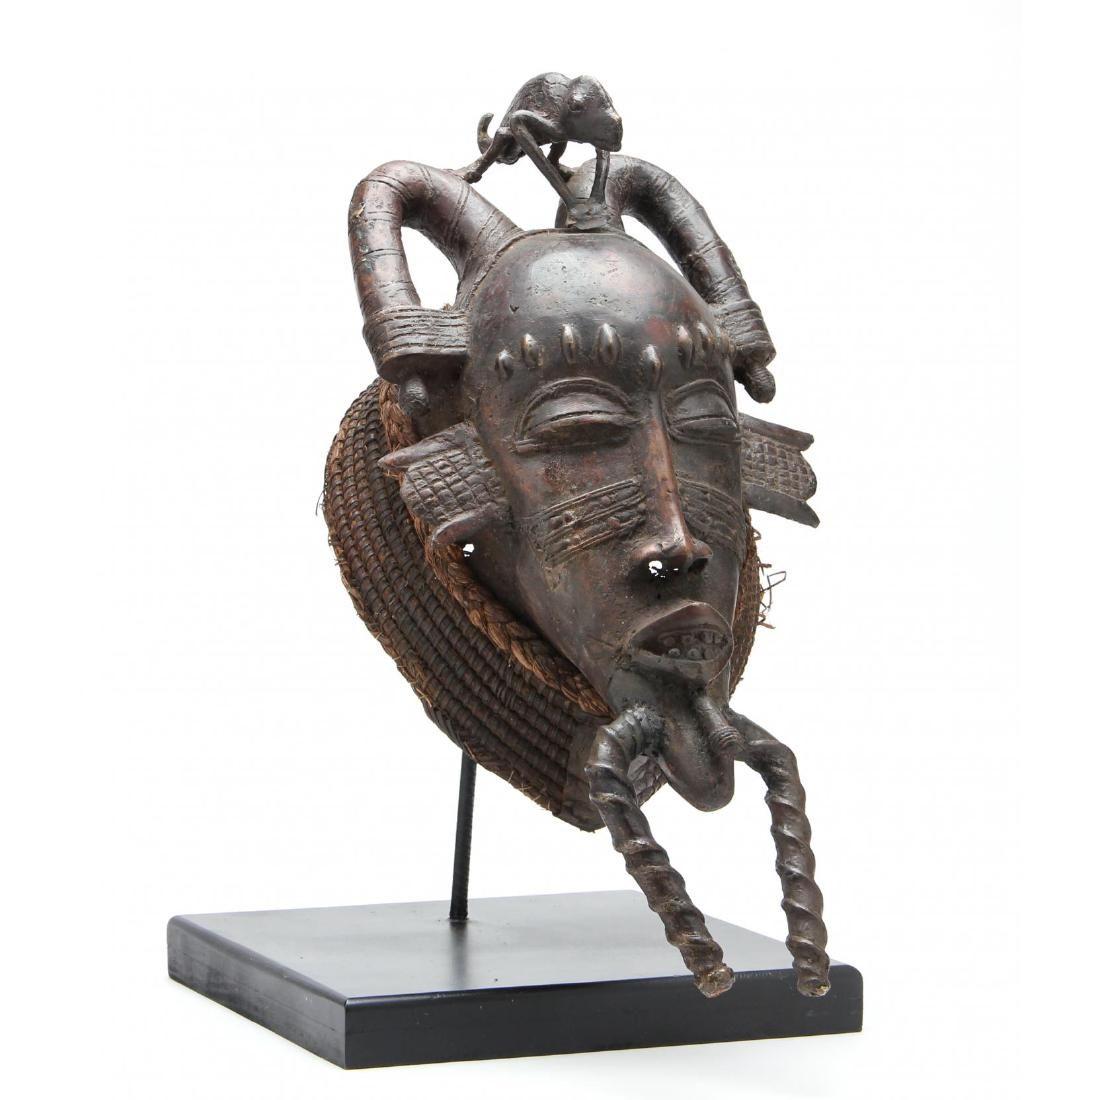 Ivory Coast or Mali, Senufo Kpelie Mask